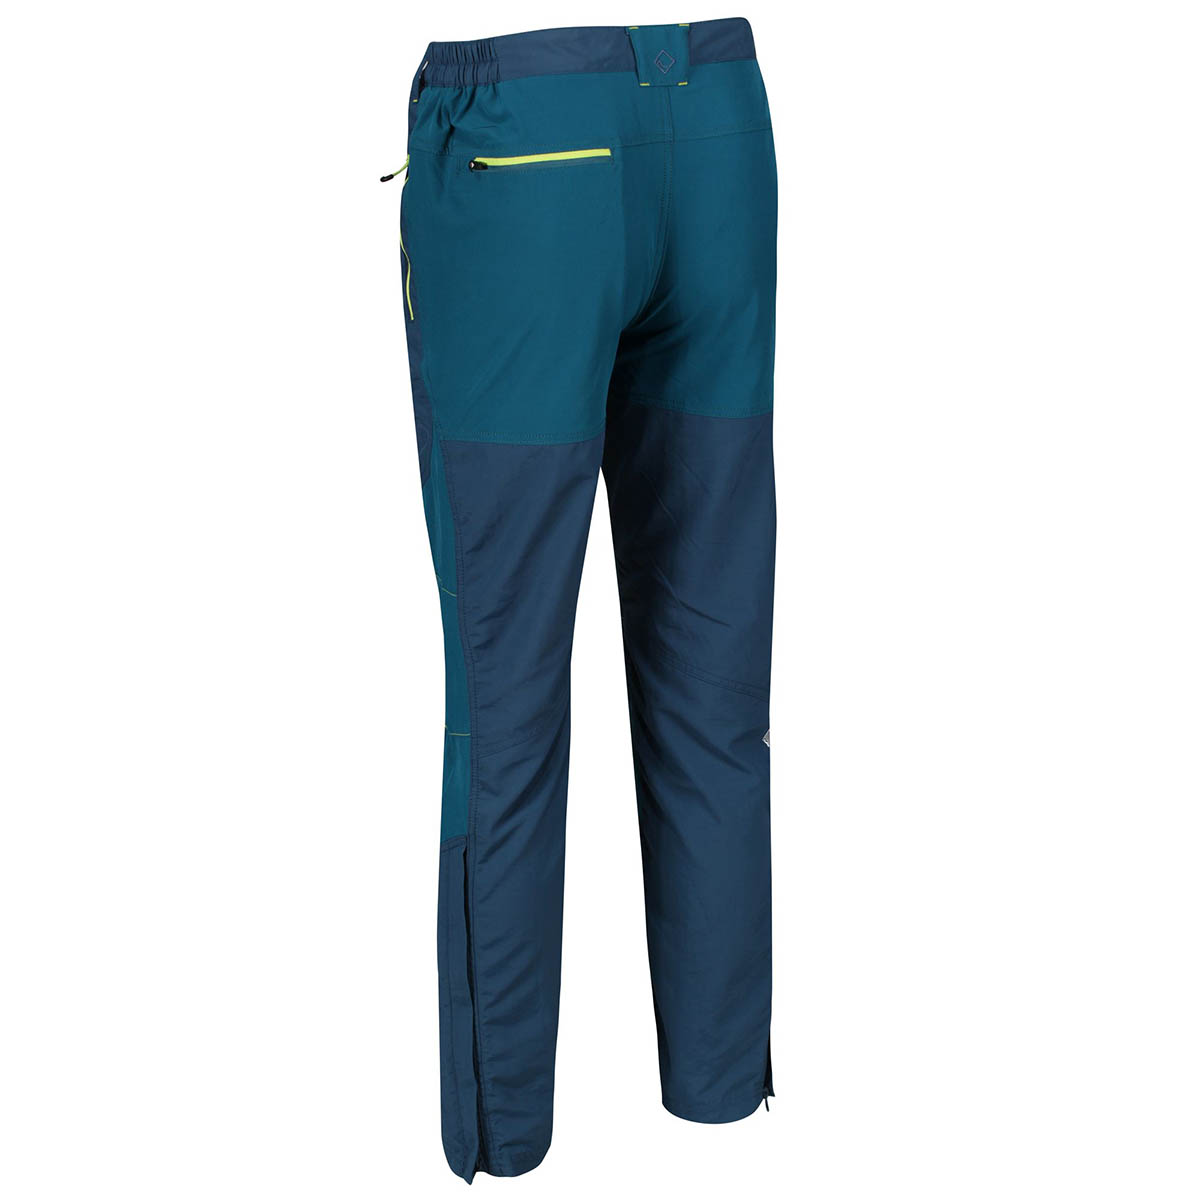 Regatta-Mens-Sungari-Lightweight-Water-Repellent-Stretch-Trousers-70-OFF-RRP thumbnail 5